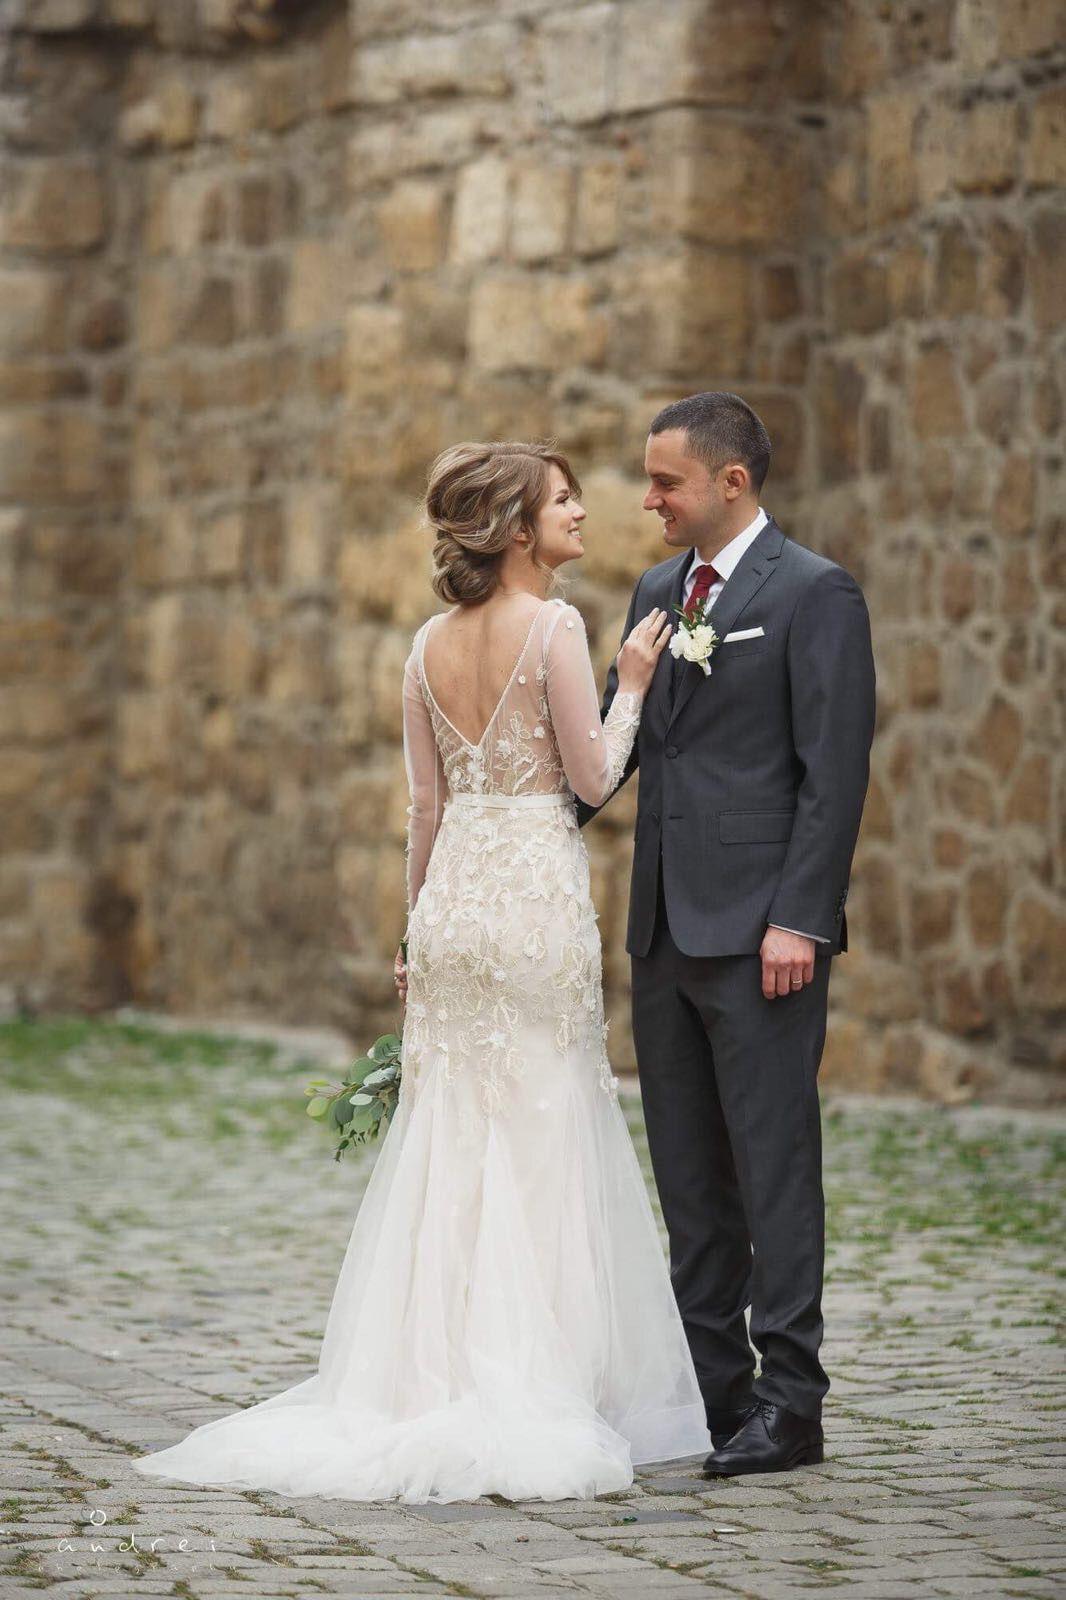 Together forever. #OtiliaBrailoiuAtelier #weddingdress